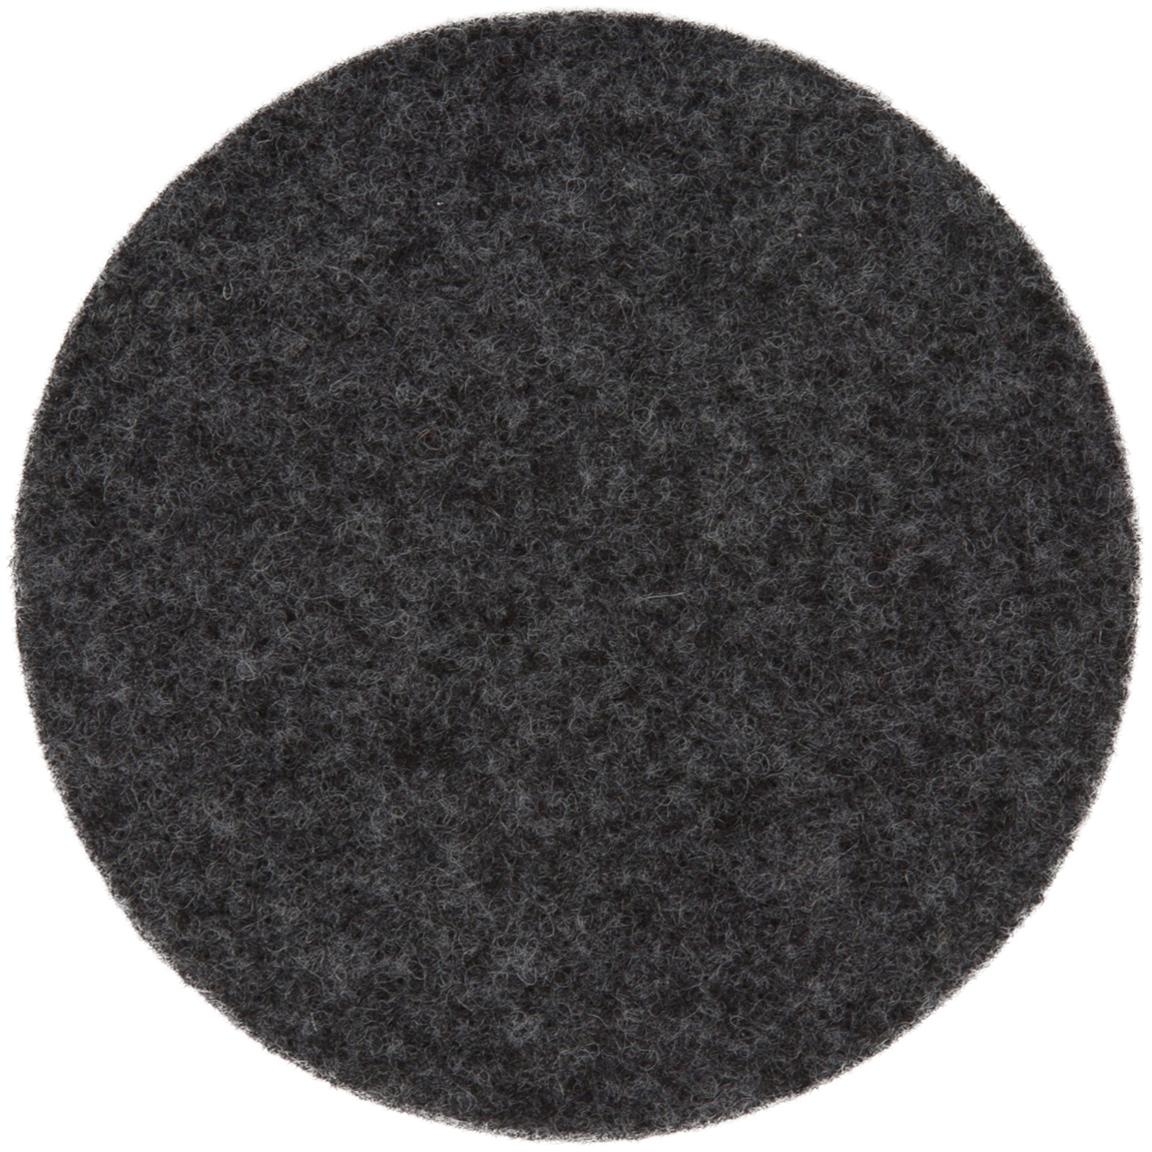 Wollen vilt onderzetter Leandra, 6 stuks, 90% wol, 10% polyethyleen, Antraciet, Ø 10 cm